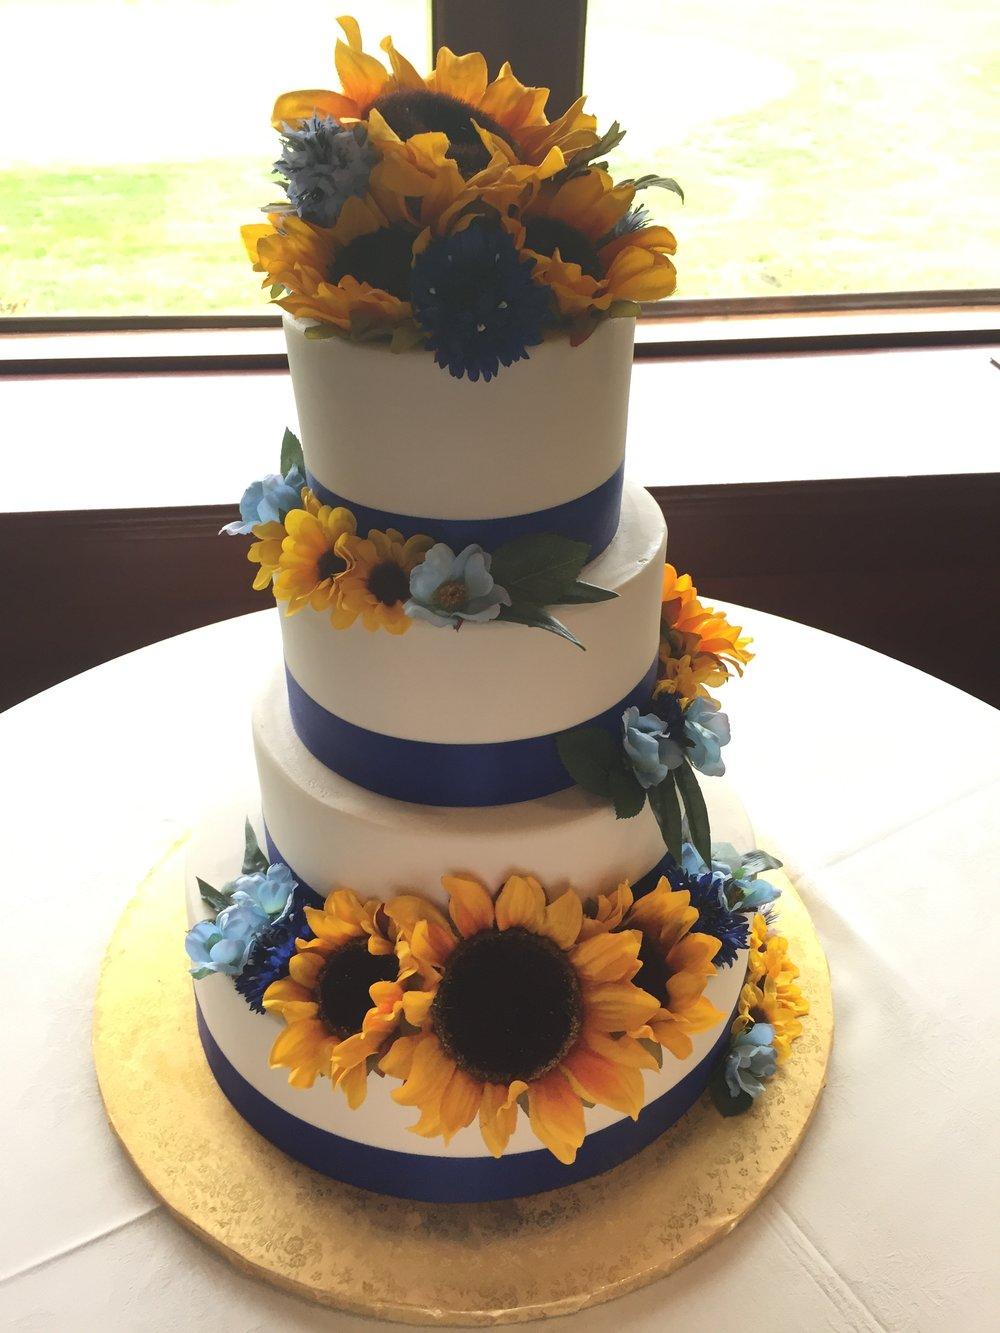 Blue Ribbon with Sunflowers Wedding Cake